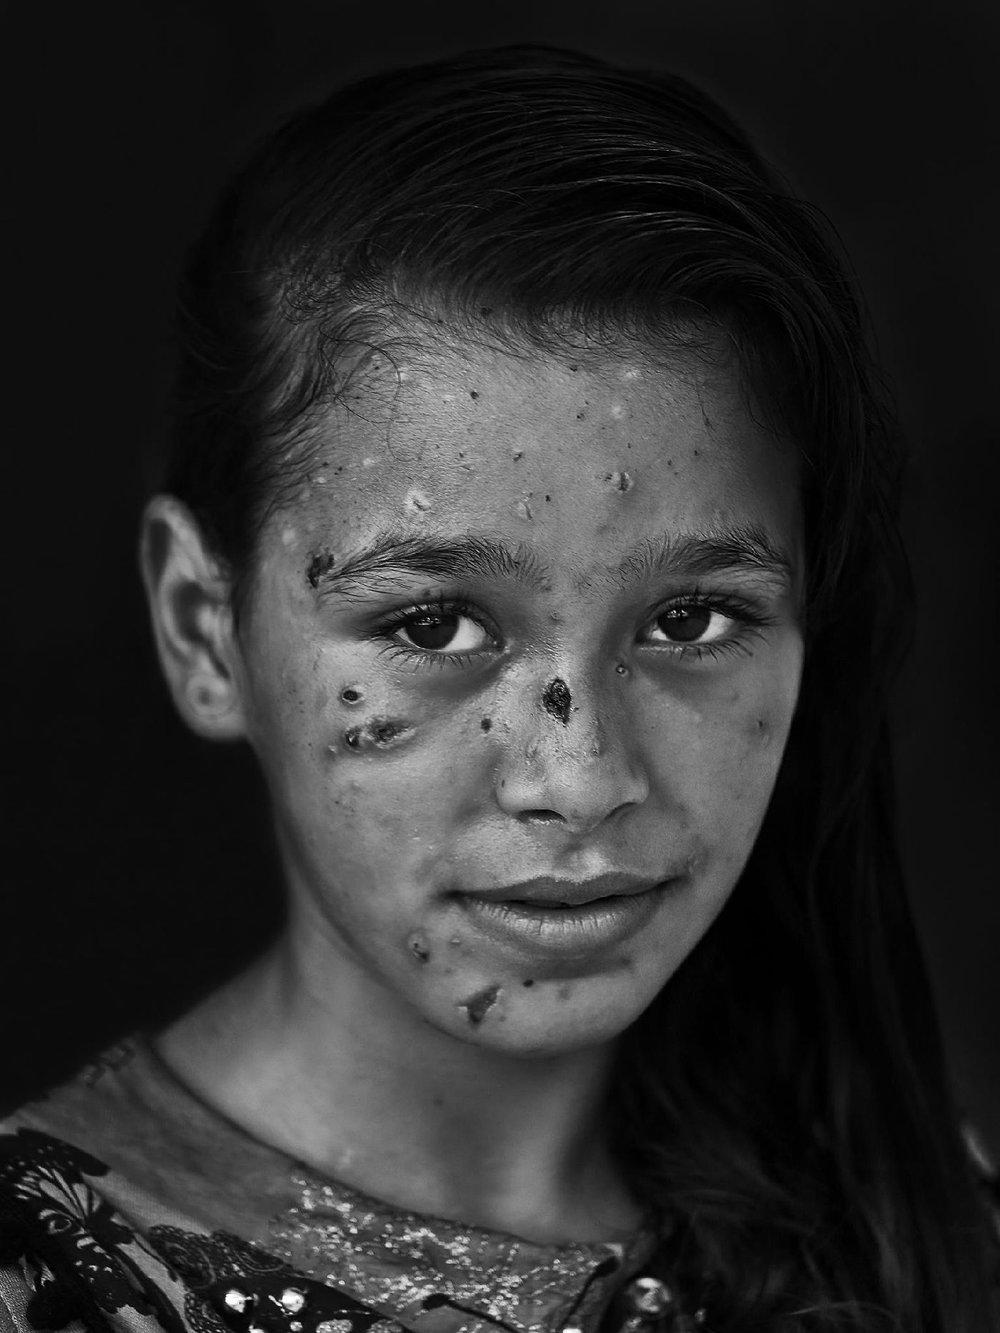 Mohammad's award-winning photograph: Dalia Kahlifa, 9-year-old Palestinian victim of Israel's 2014 incursion on Gaza